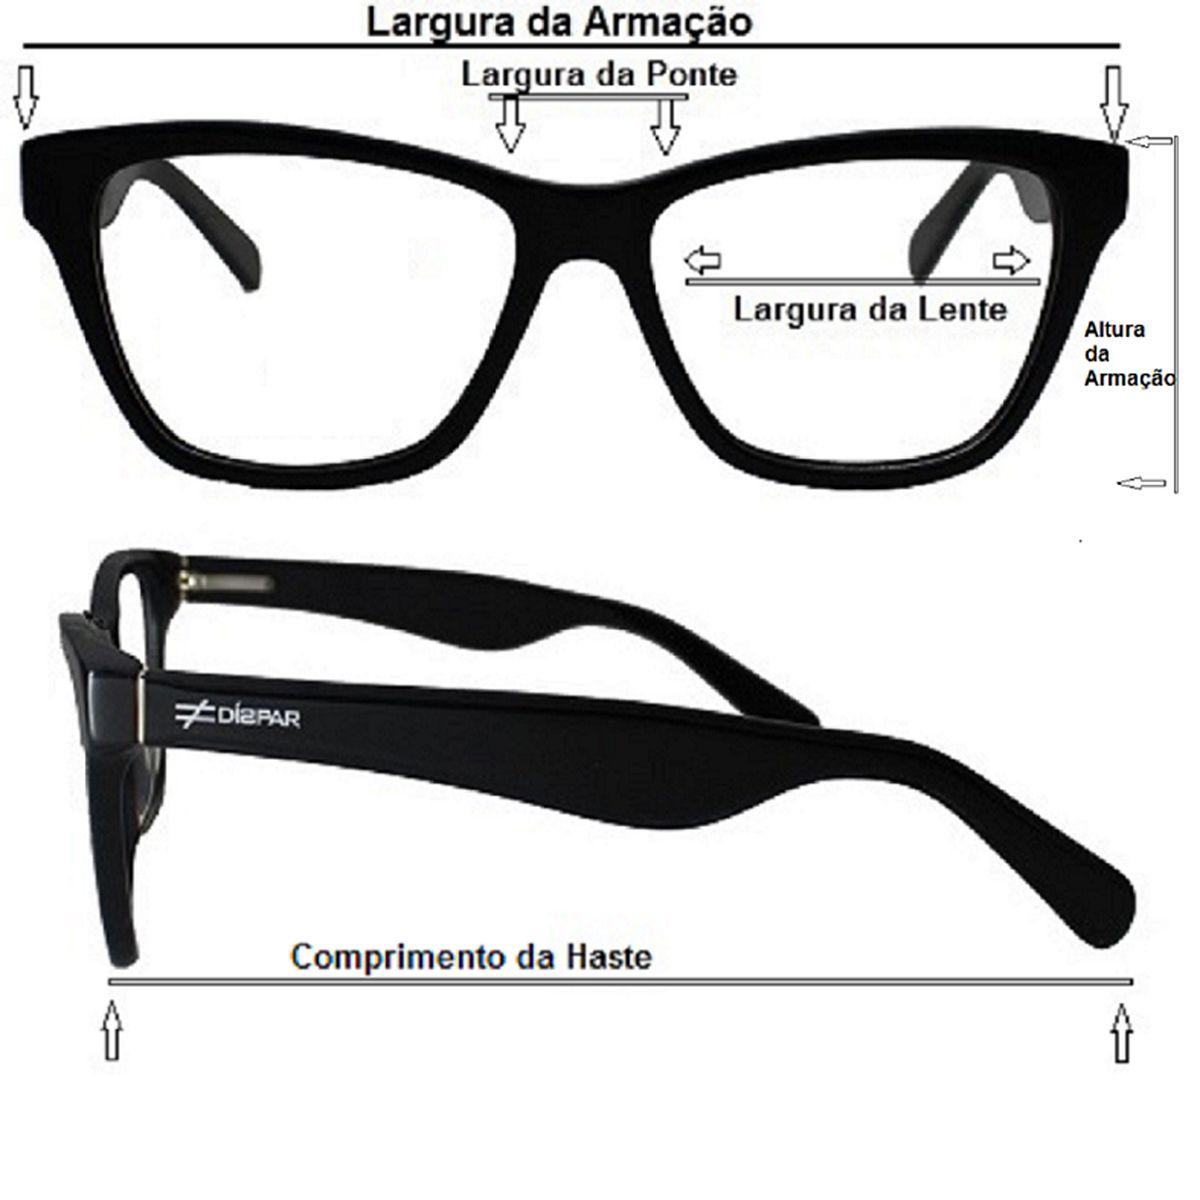 Óculos de Sol Díspar ID1962 Infantil - Aviador - 6 a 9 anos - Preto